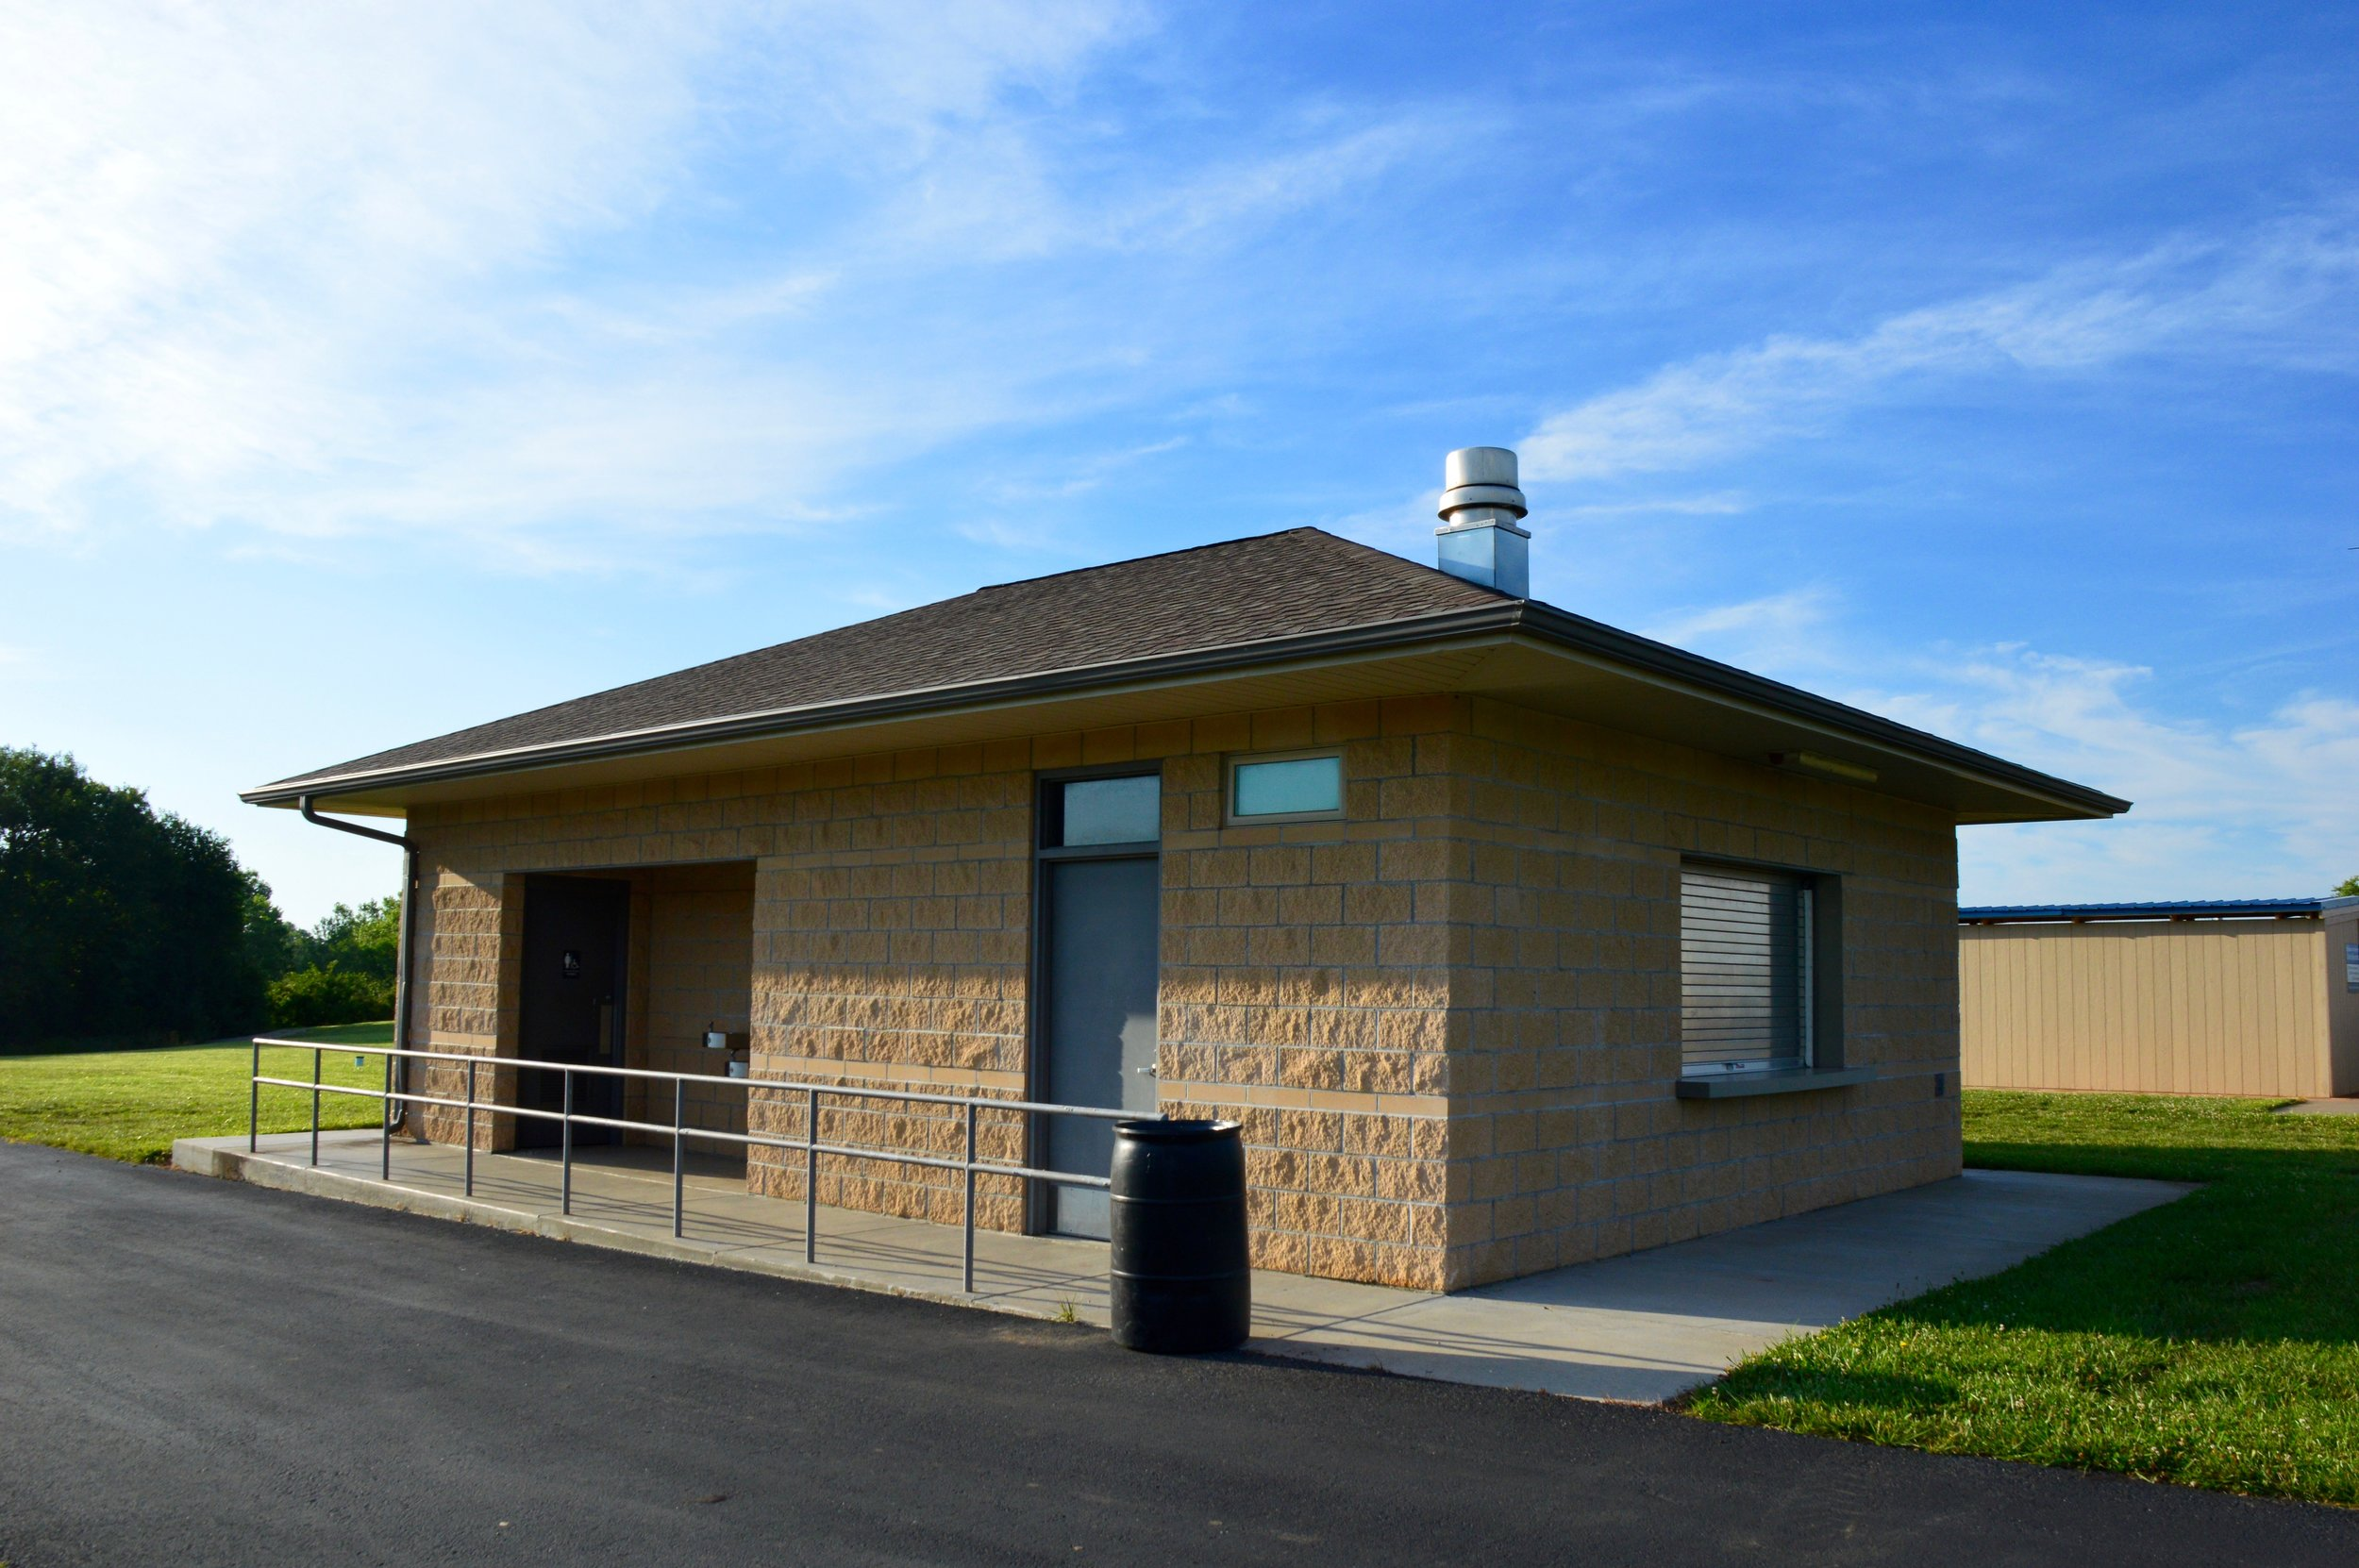 USD 437 Softball Facility   Client: USD 437 Auburn Washburn Architect: HTK Architects